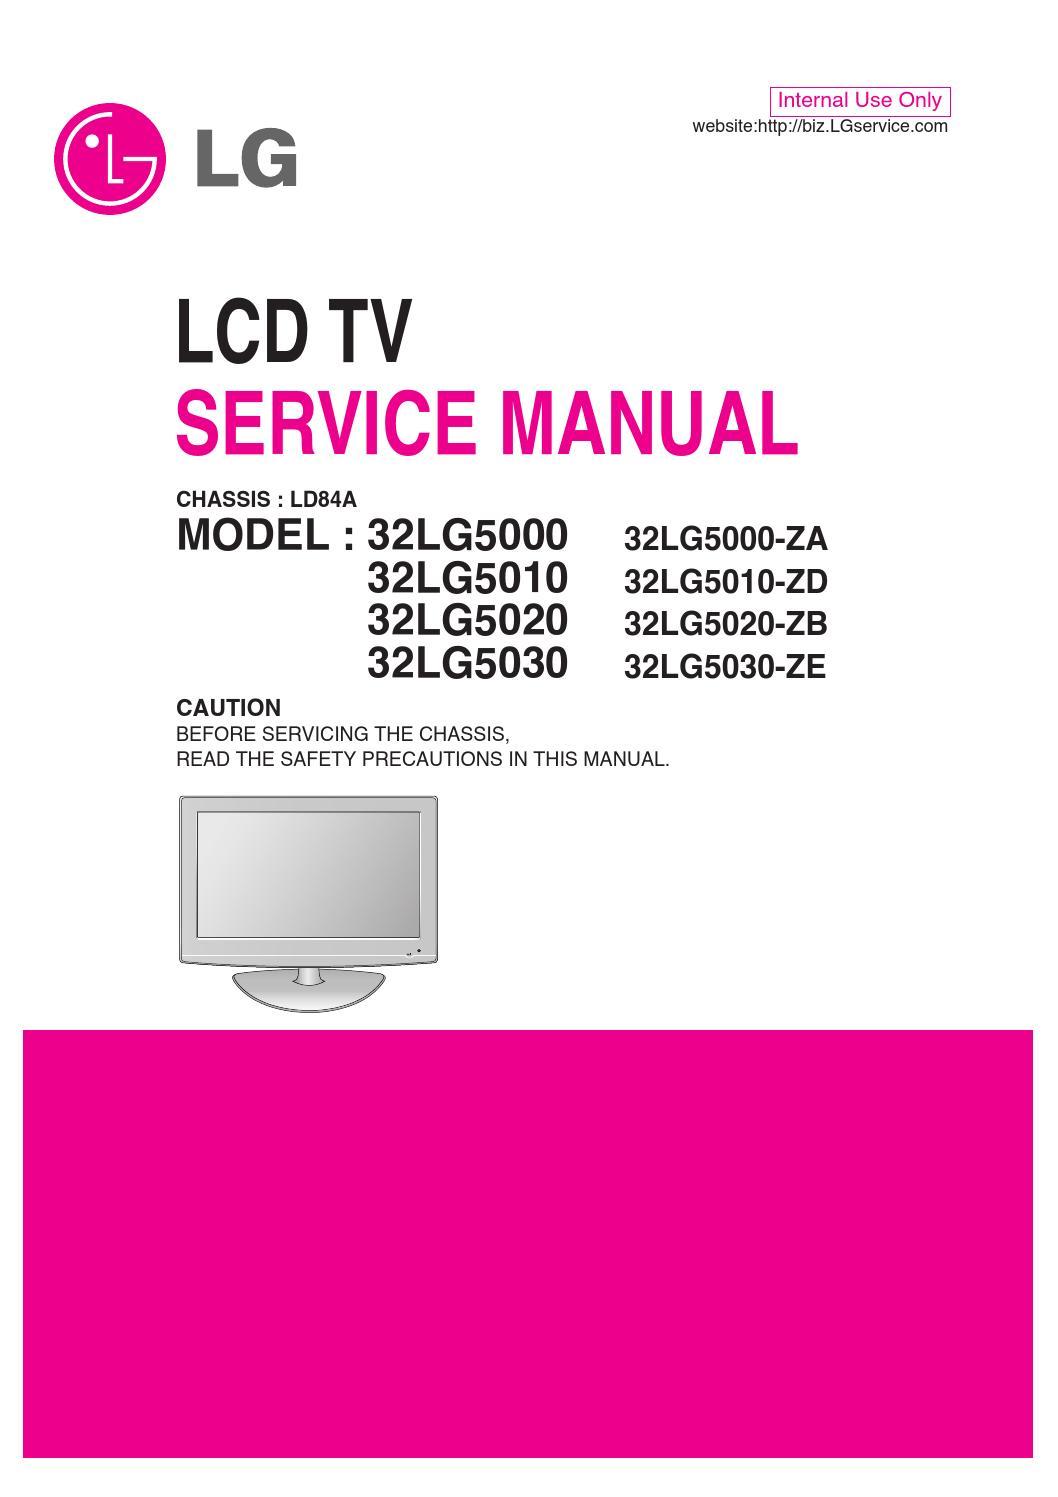 Manual De Servi U00e7o Televisor Lg 32lg5000